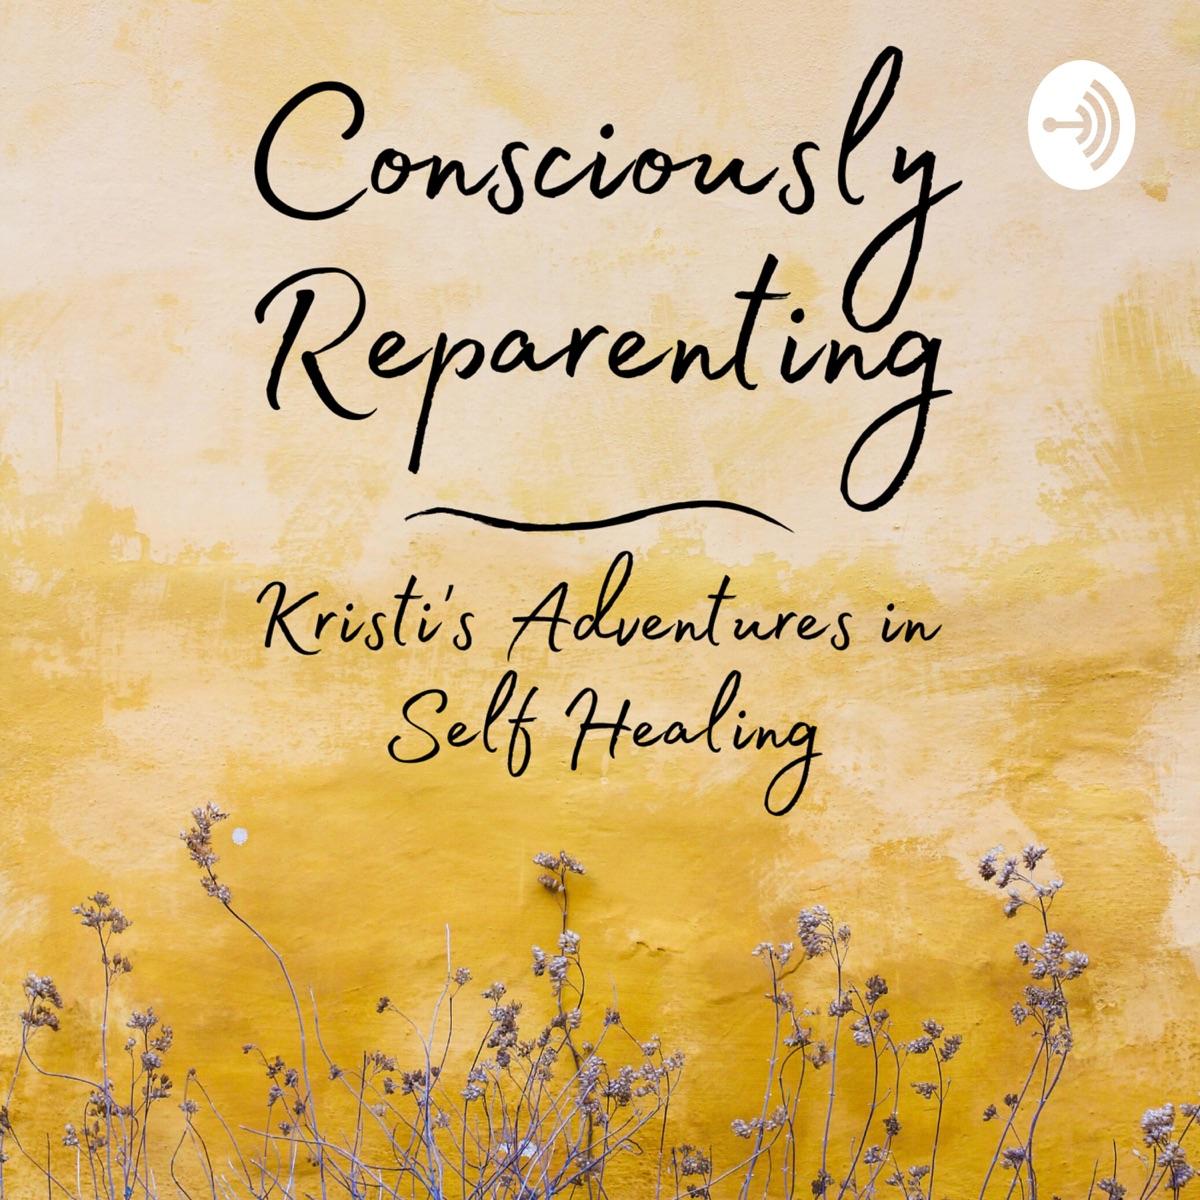 Consciously Reparenting: Kristi's Adventures in Self Healing